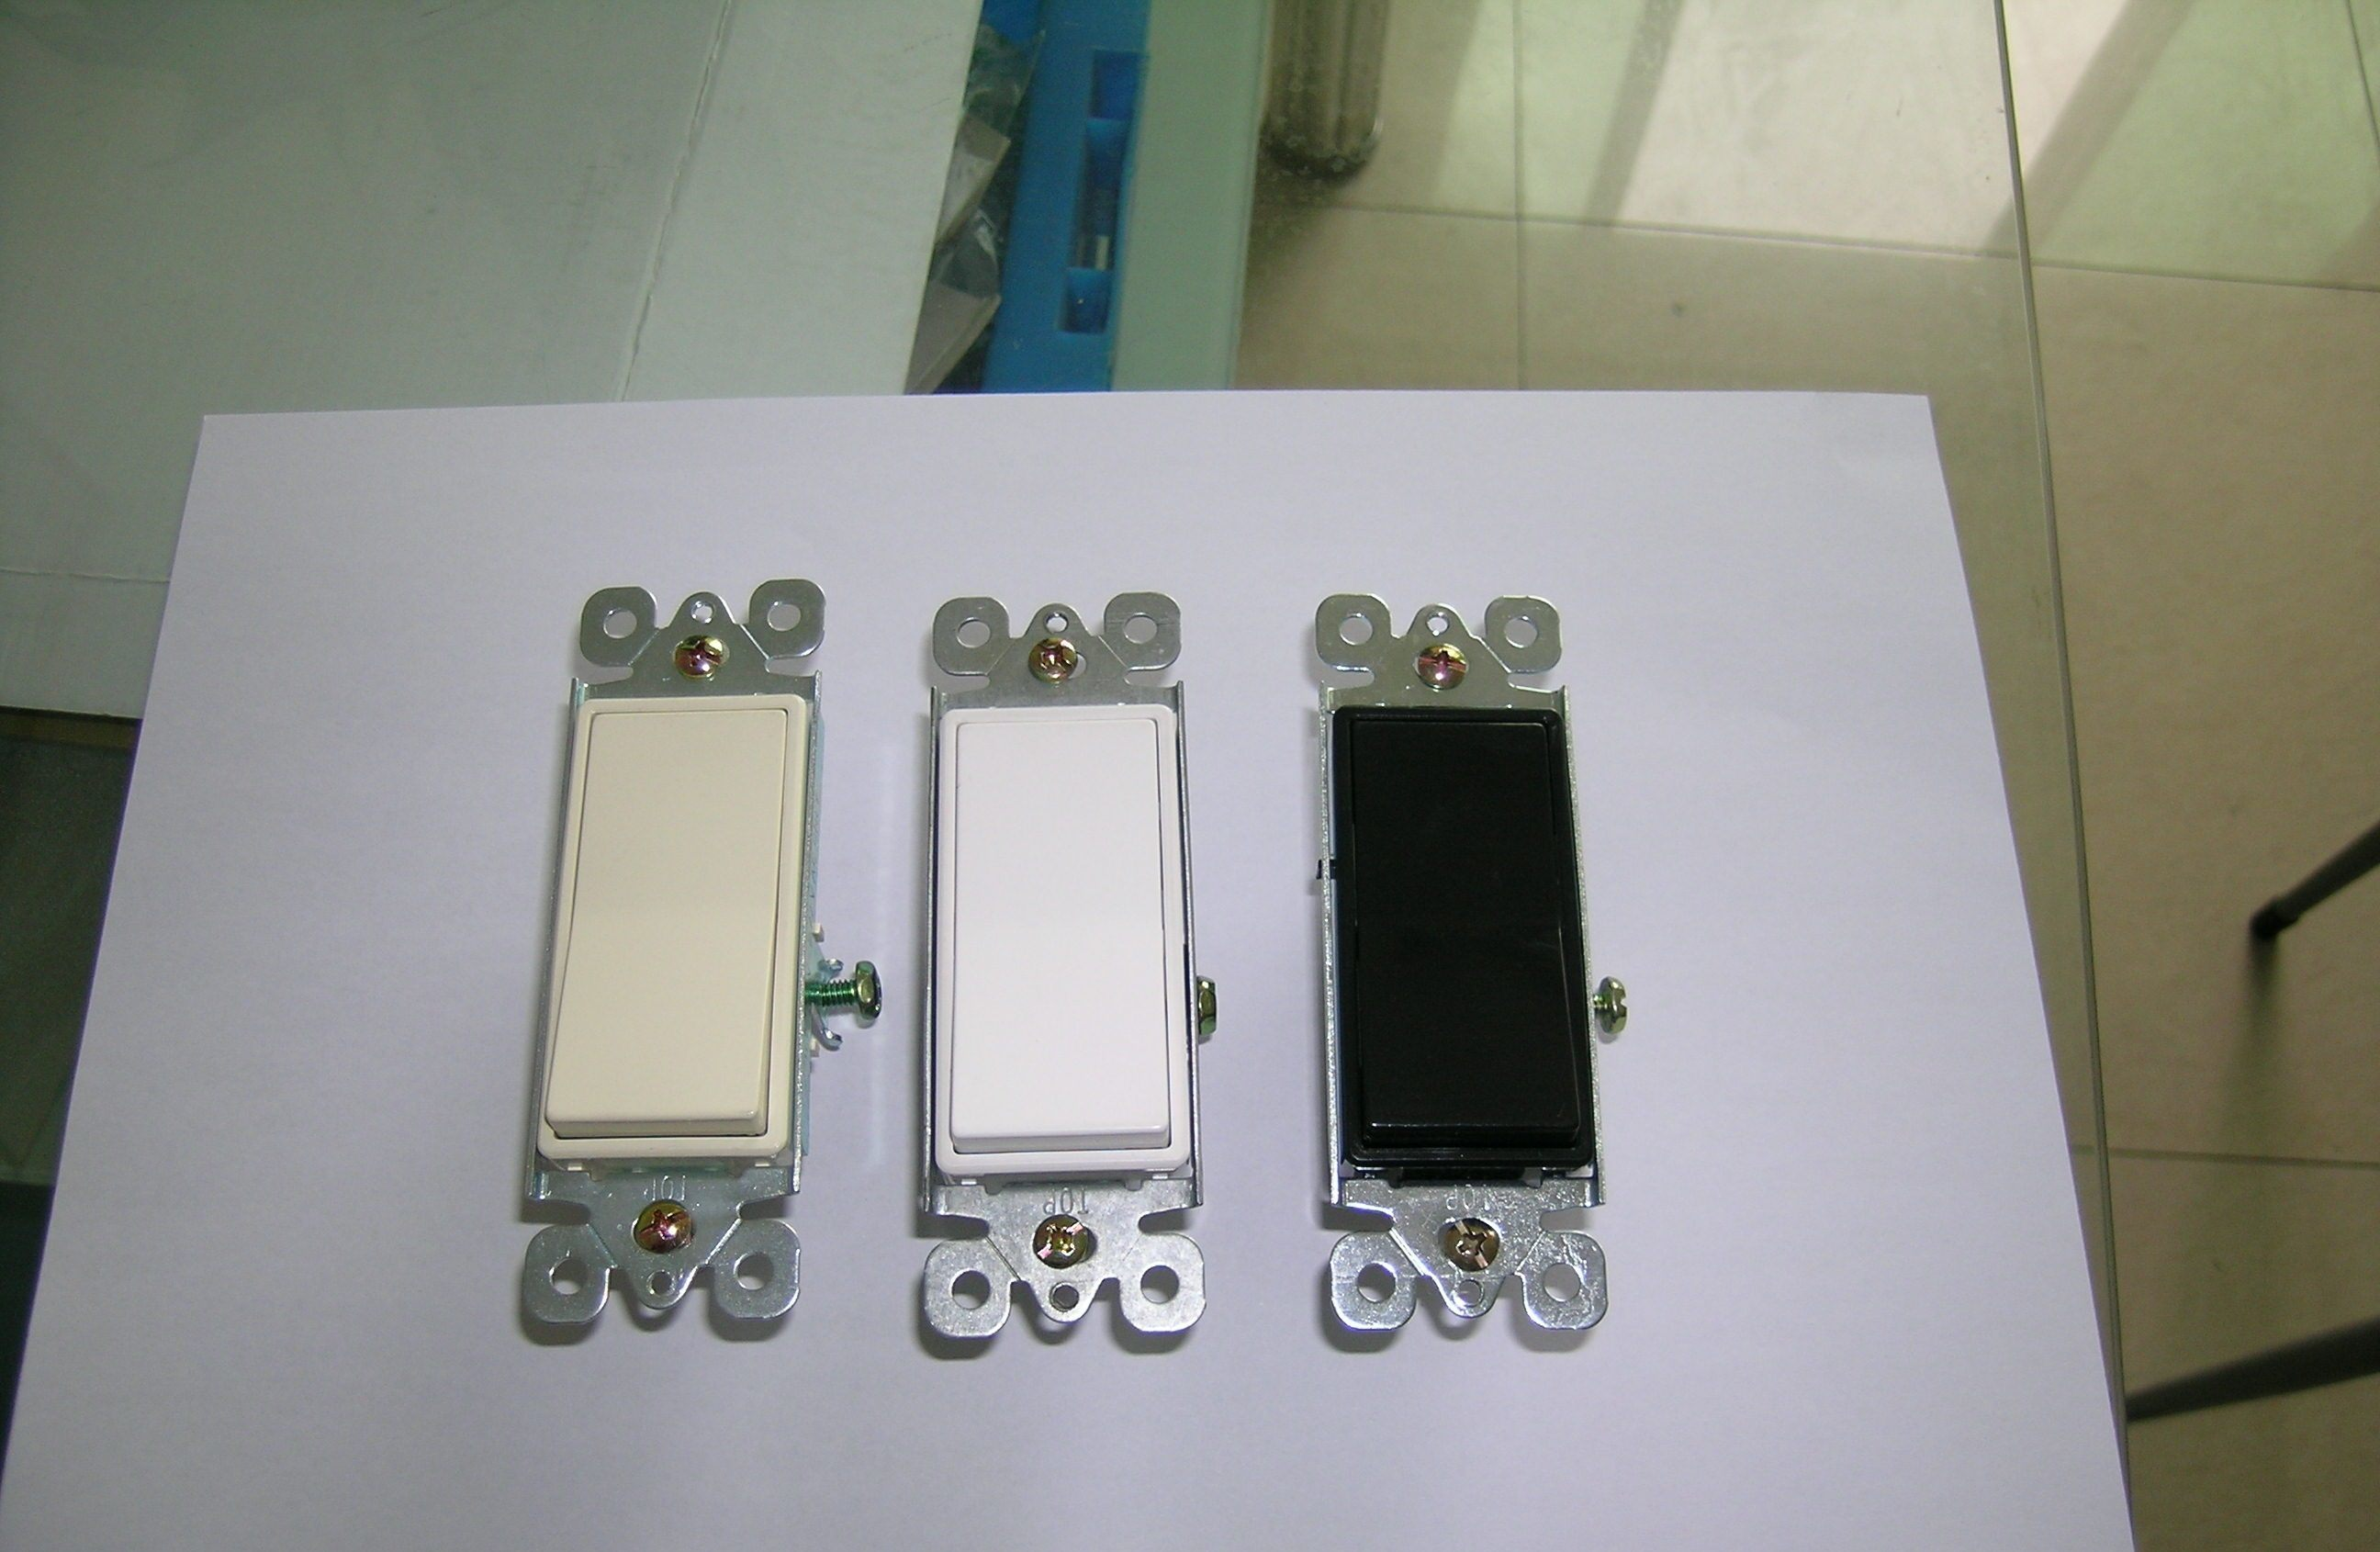 15A 120/277V Decora Rocker 3-Way Switch, Residential Grade, UL/cUL